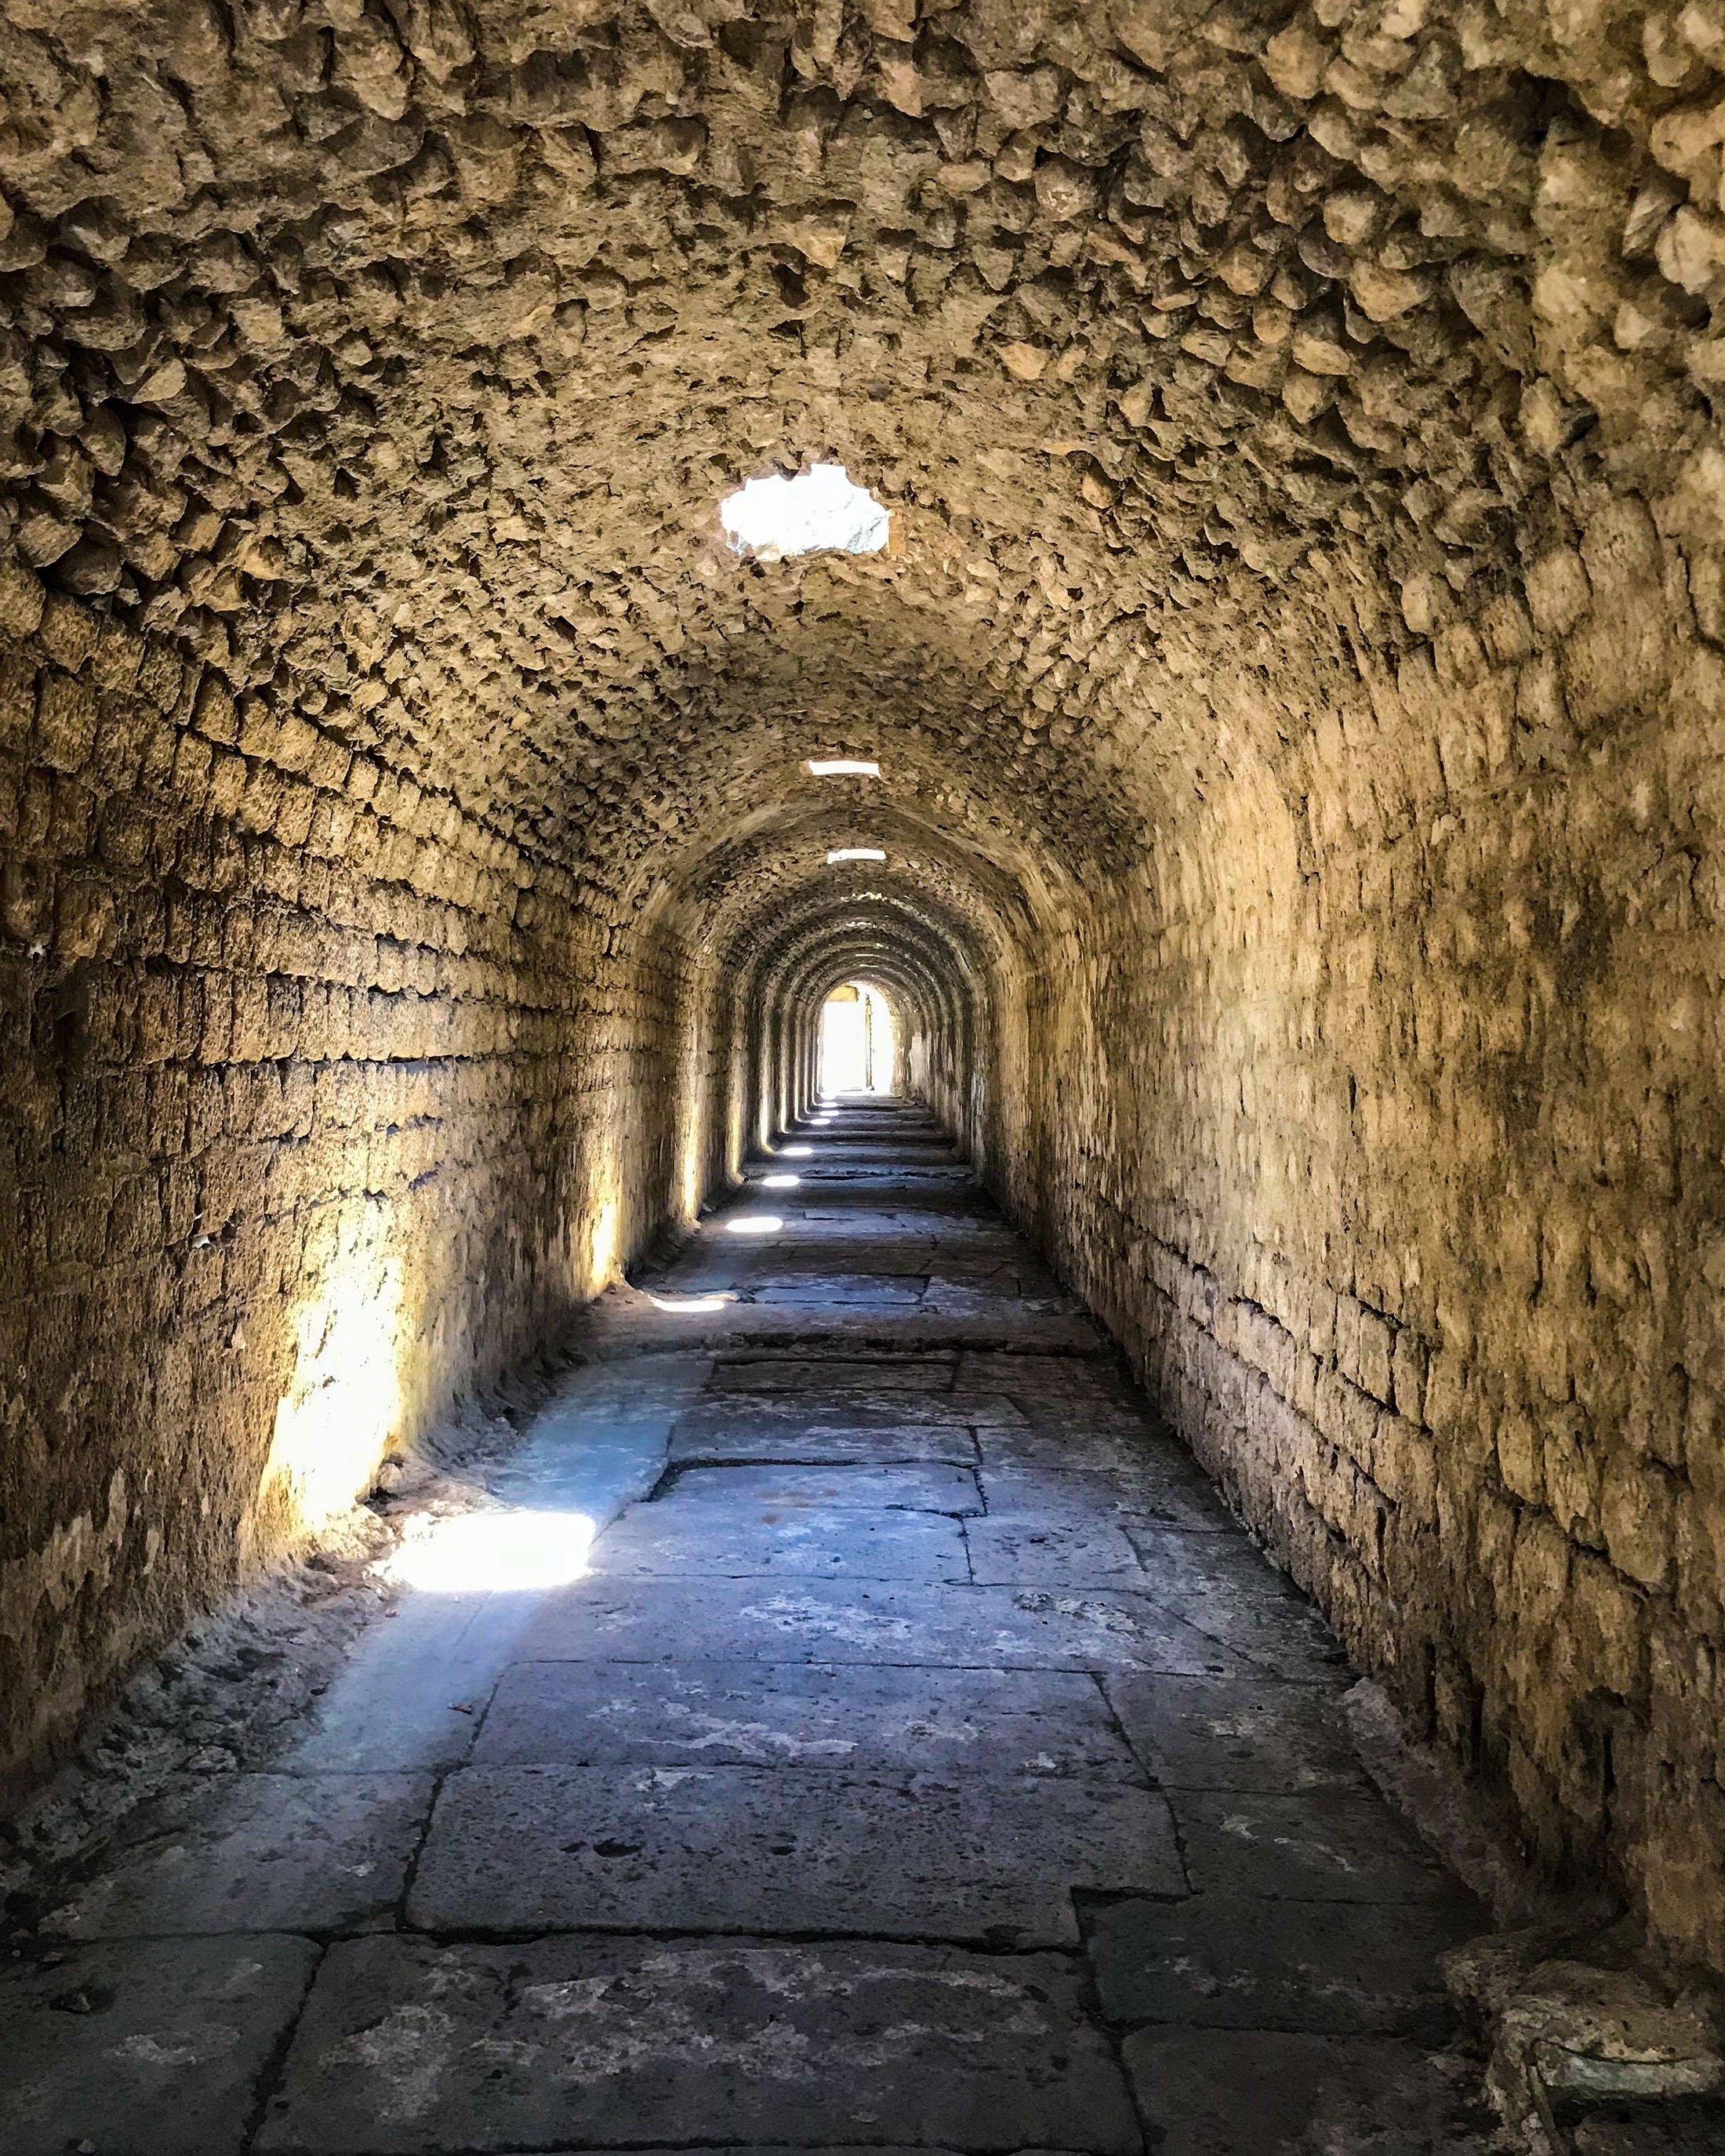 The tunnel at Asclepion. (Photo by Argun Konuk)